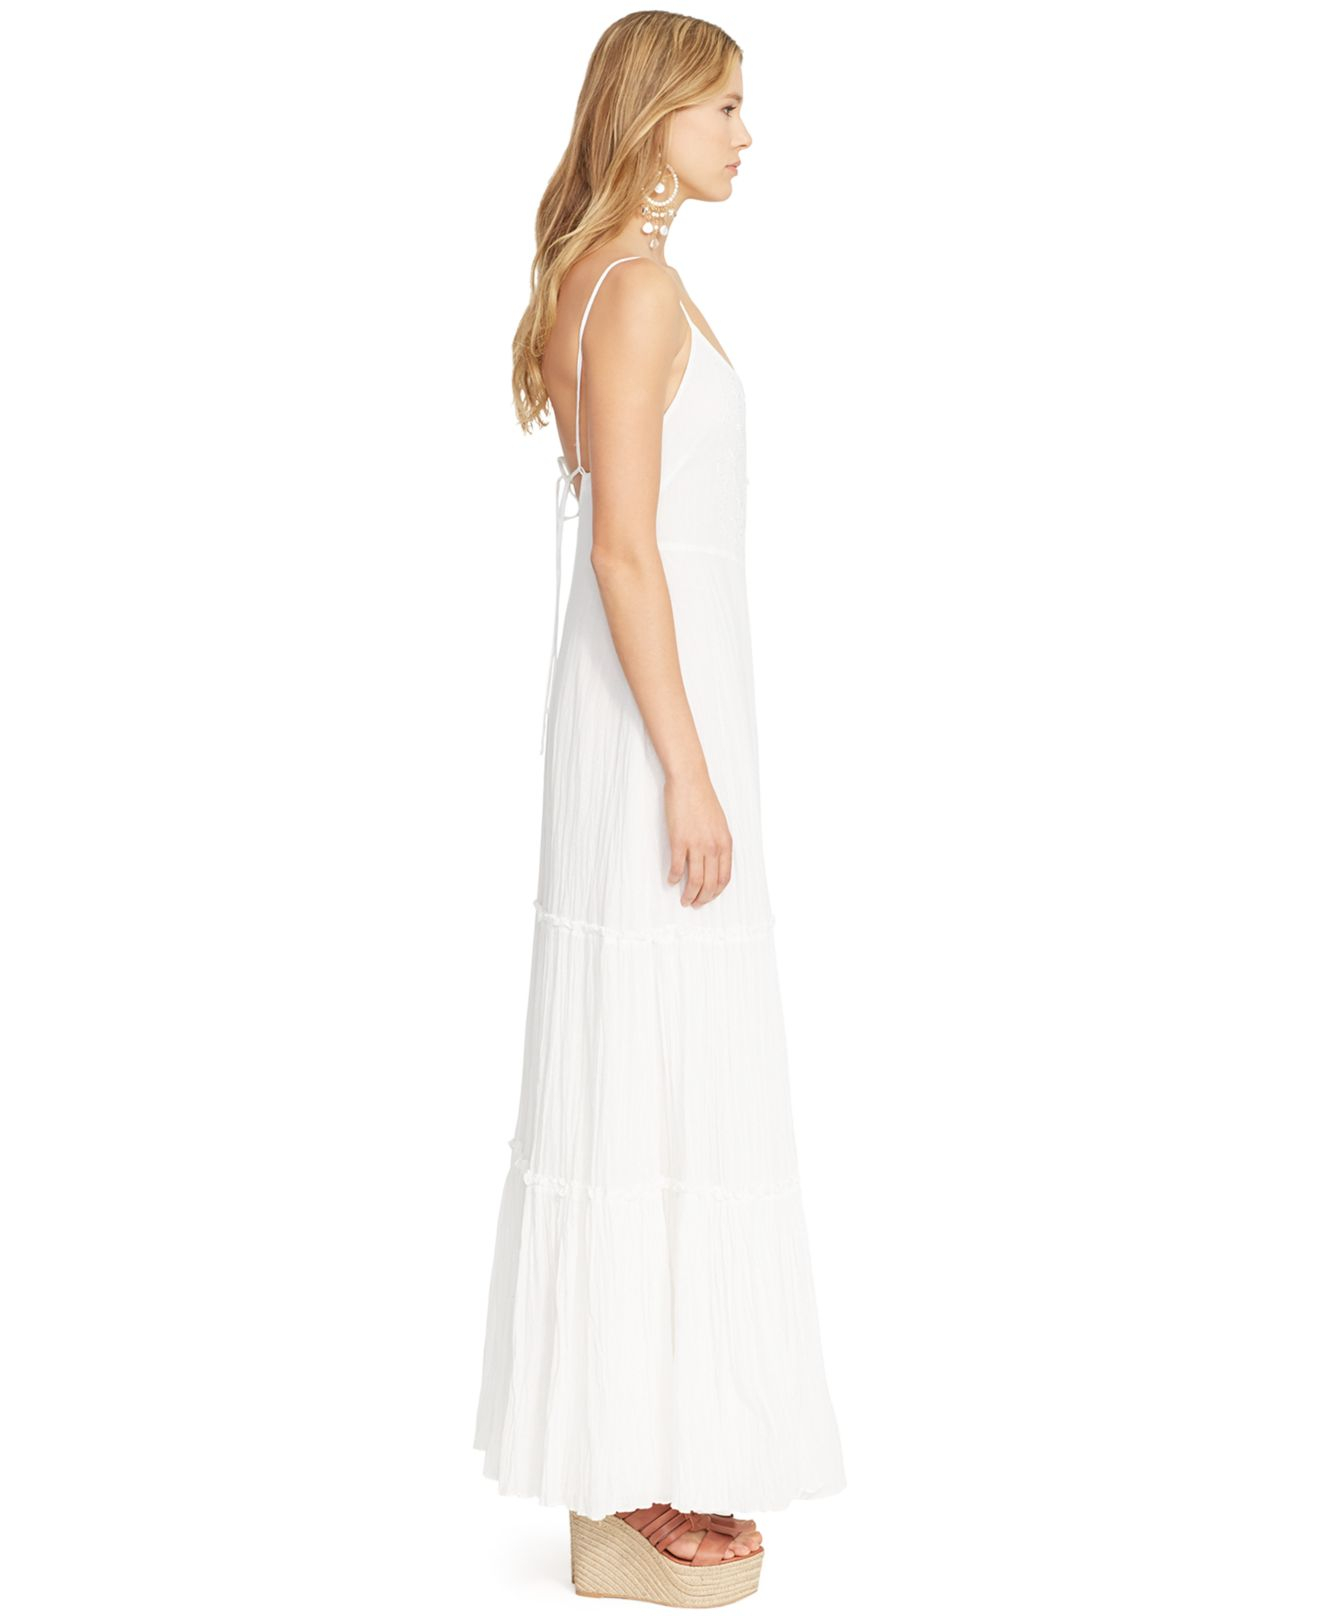 White sleeveless maxi dresses